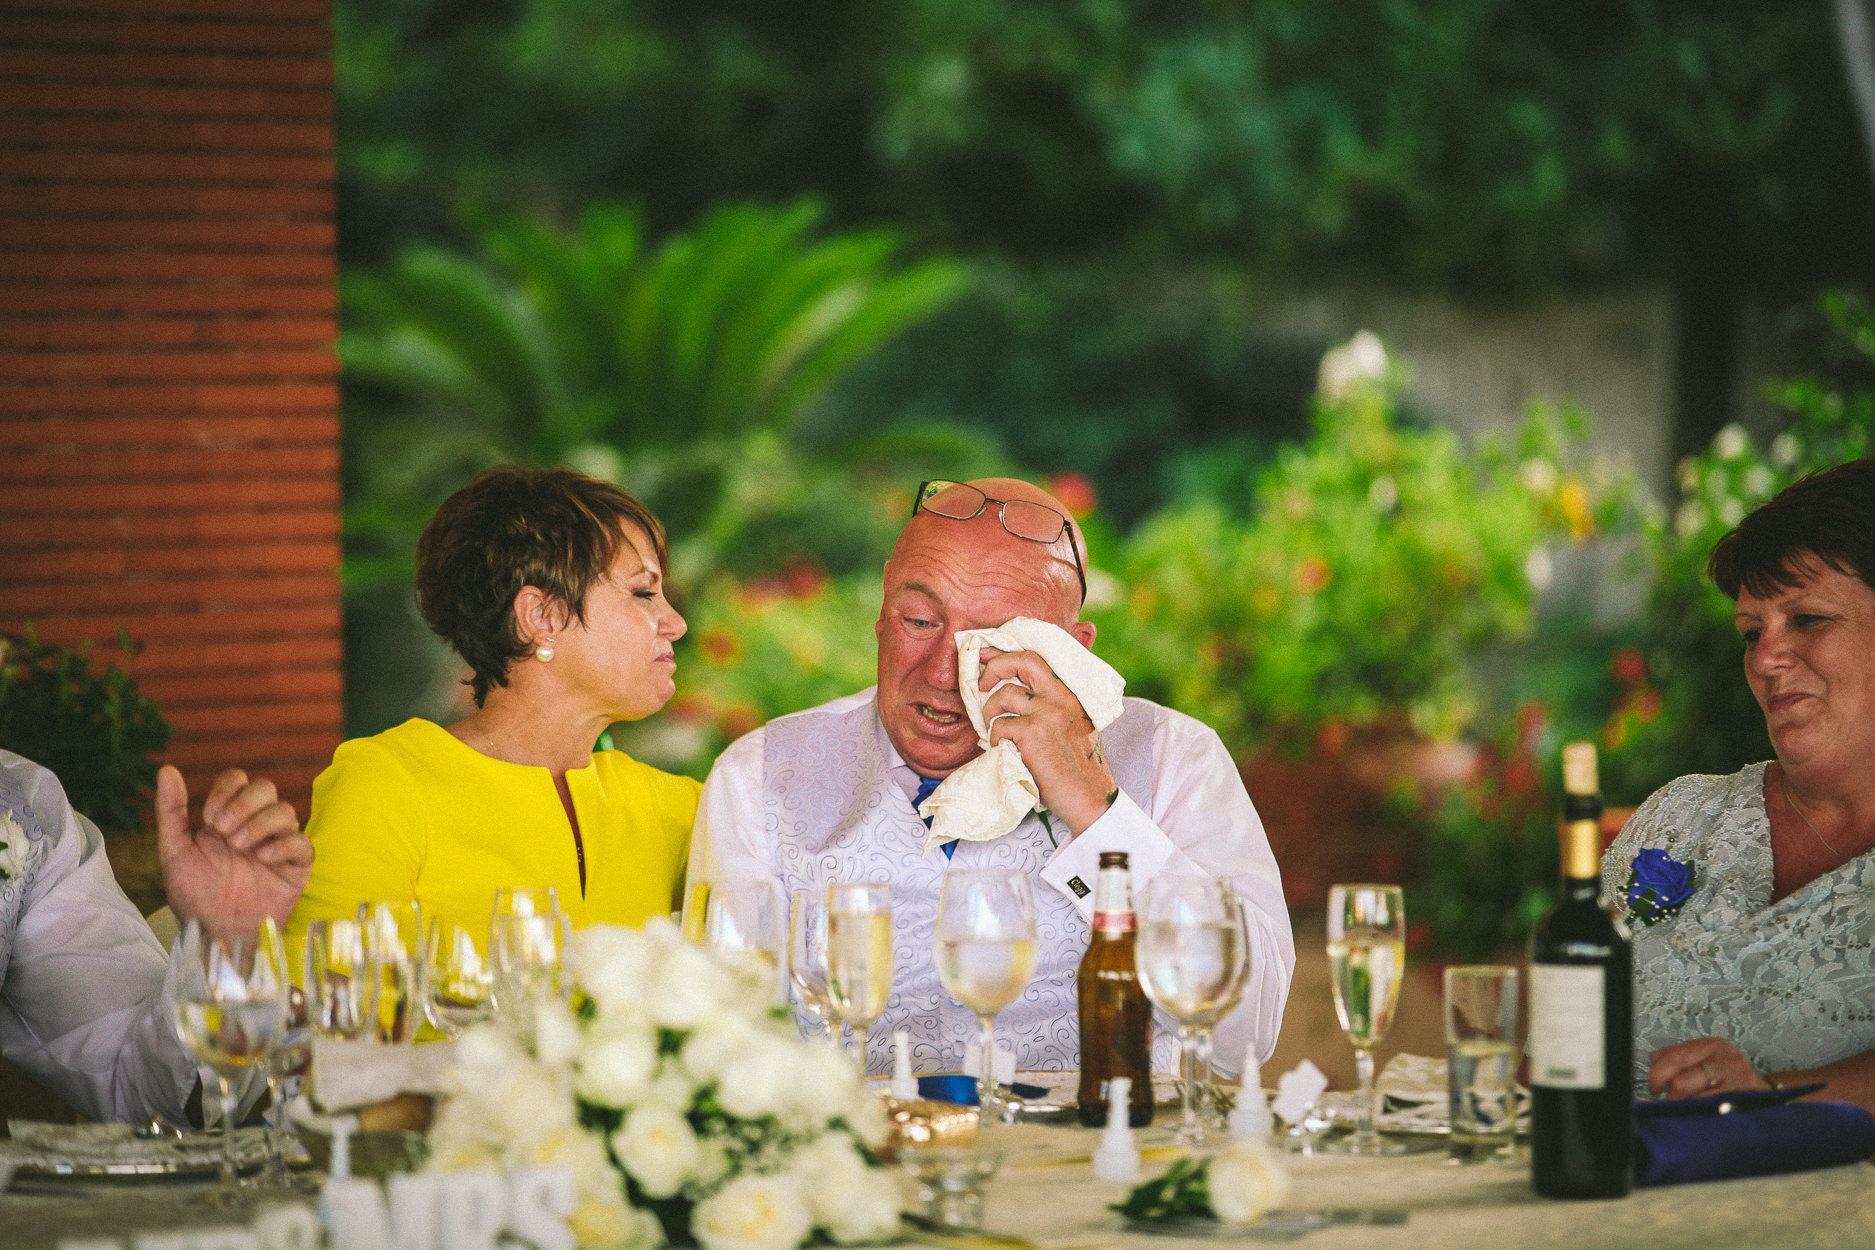 Amalfi-Coast-wedding-venue-Wedding-Photography-Villa Antiche Mura-Sorrento-Italy-17